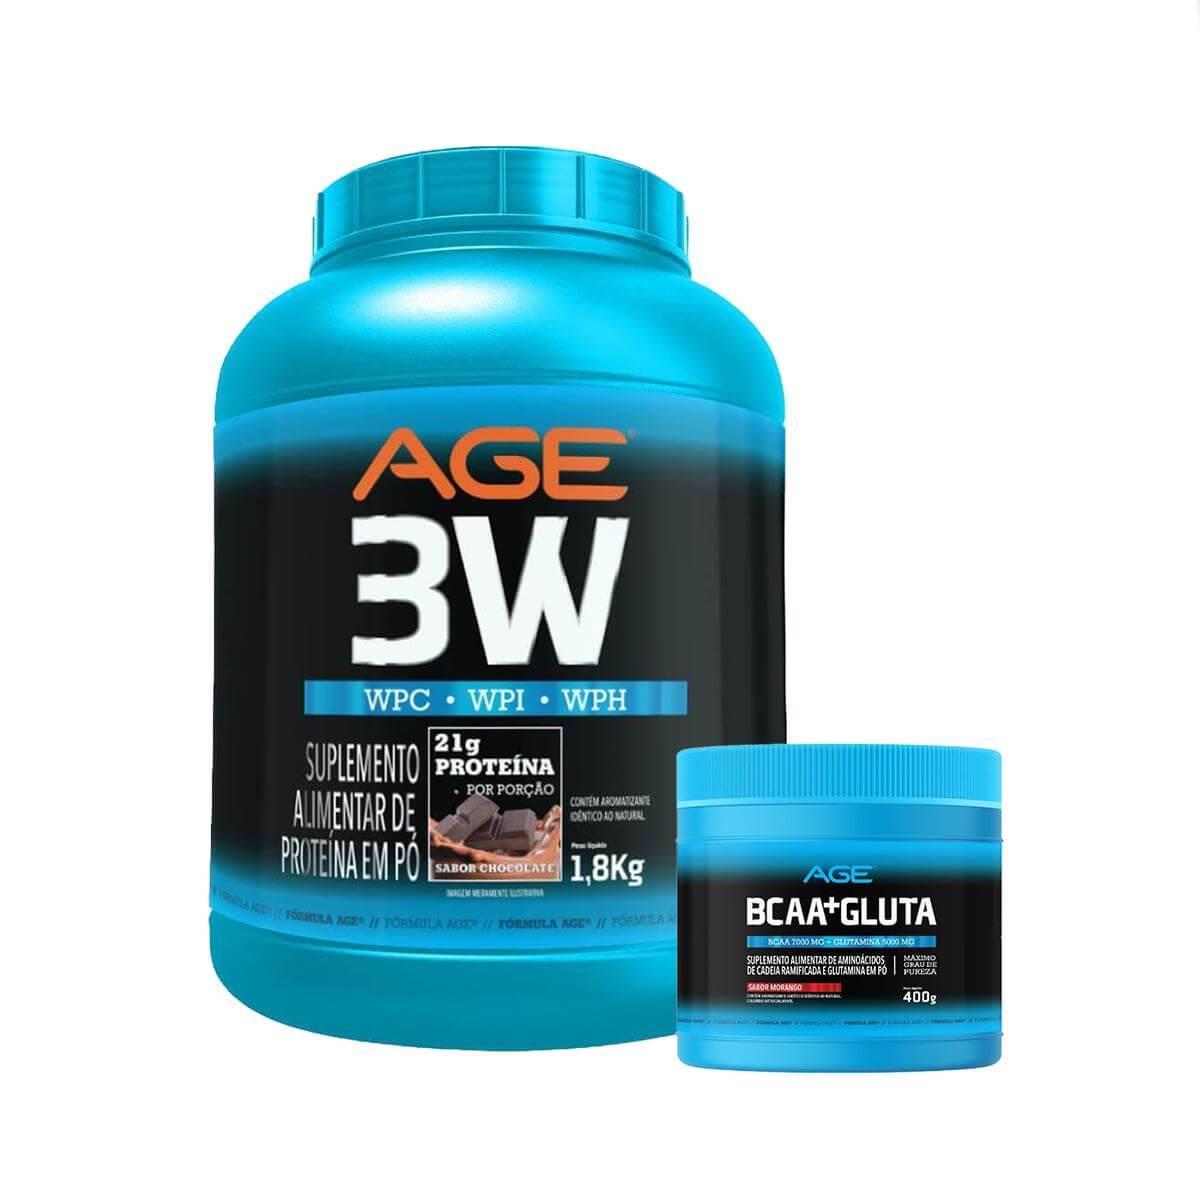 Whey 3W + BCAA e Glutamina (1,8Kg) - Chocolate - AGE